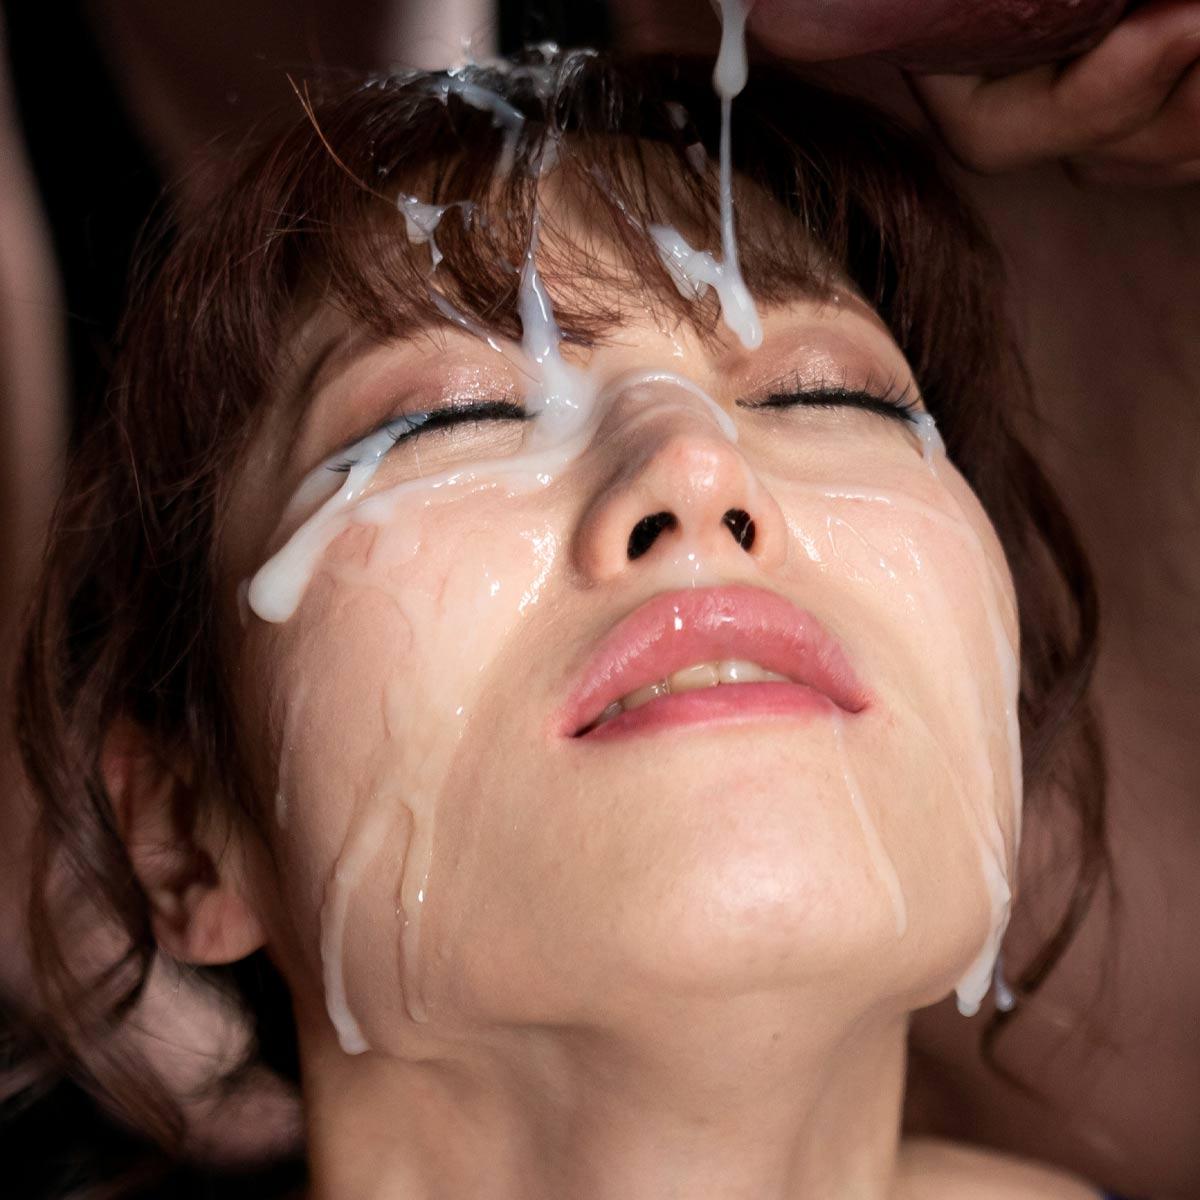 SpermMania | Nude Japanese AV Idols in uncensored Facial and Cum Fetish videos. Facials, Bukkake, Sperm Mania. The ultimate Japanese hardcore page